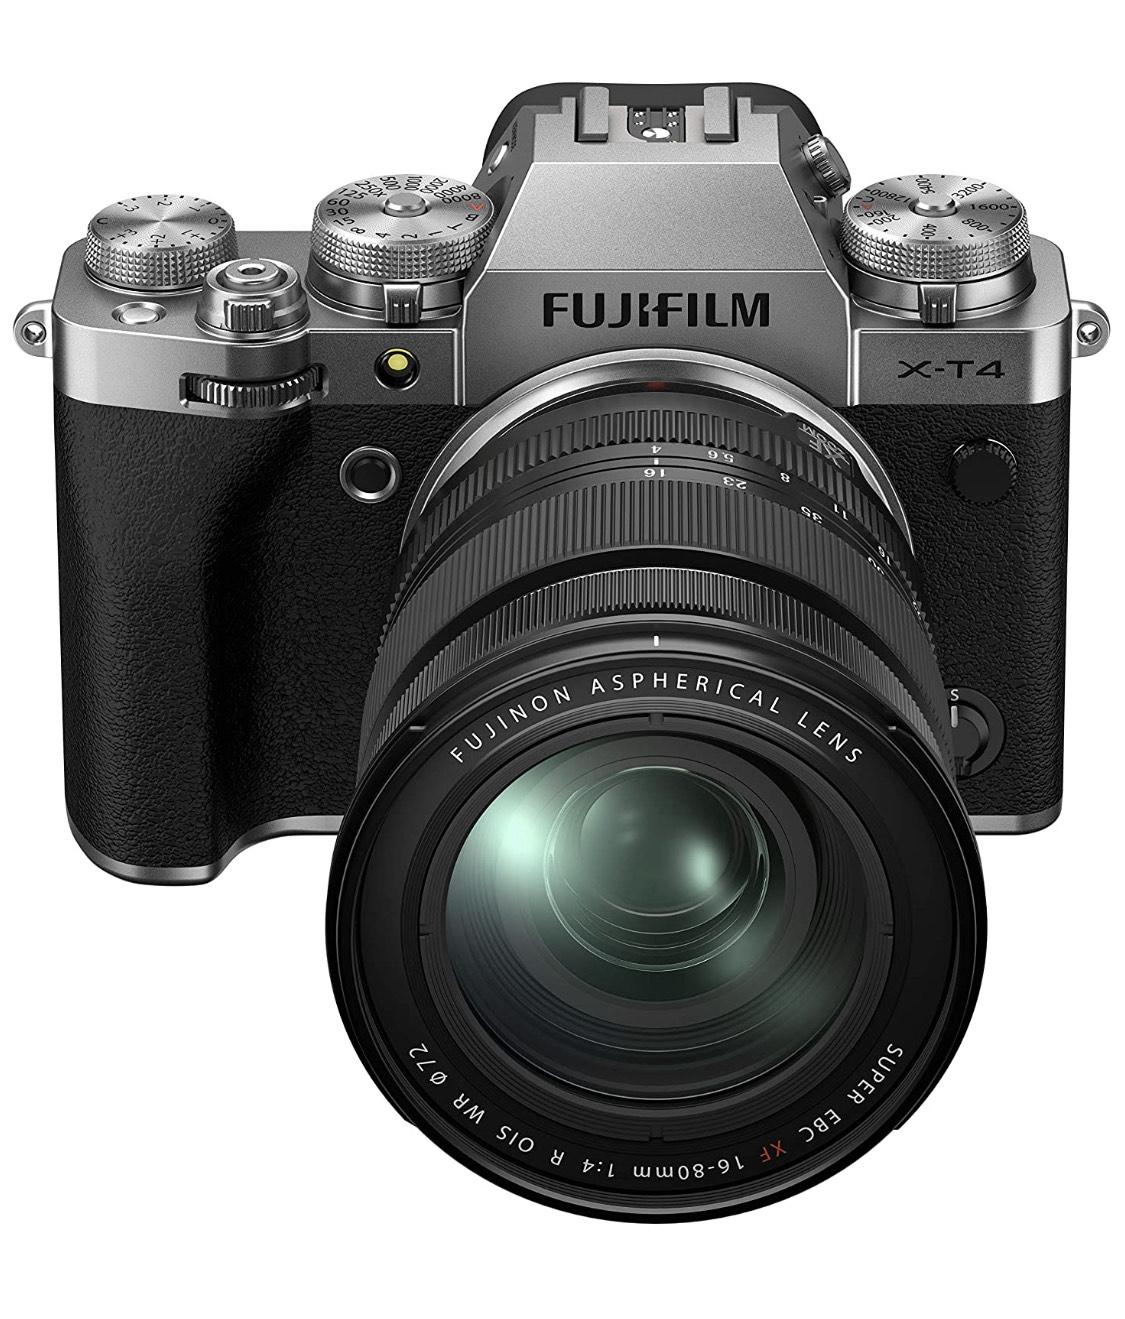 Fujifilm X-T4 mit 16-80mm objektiv nur in Silber